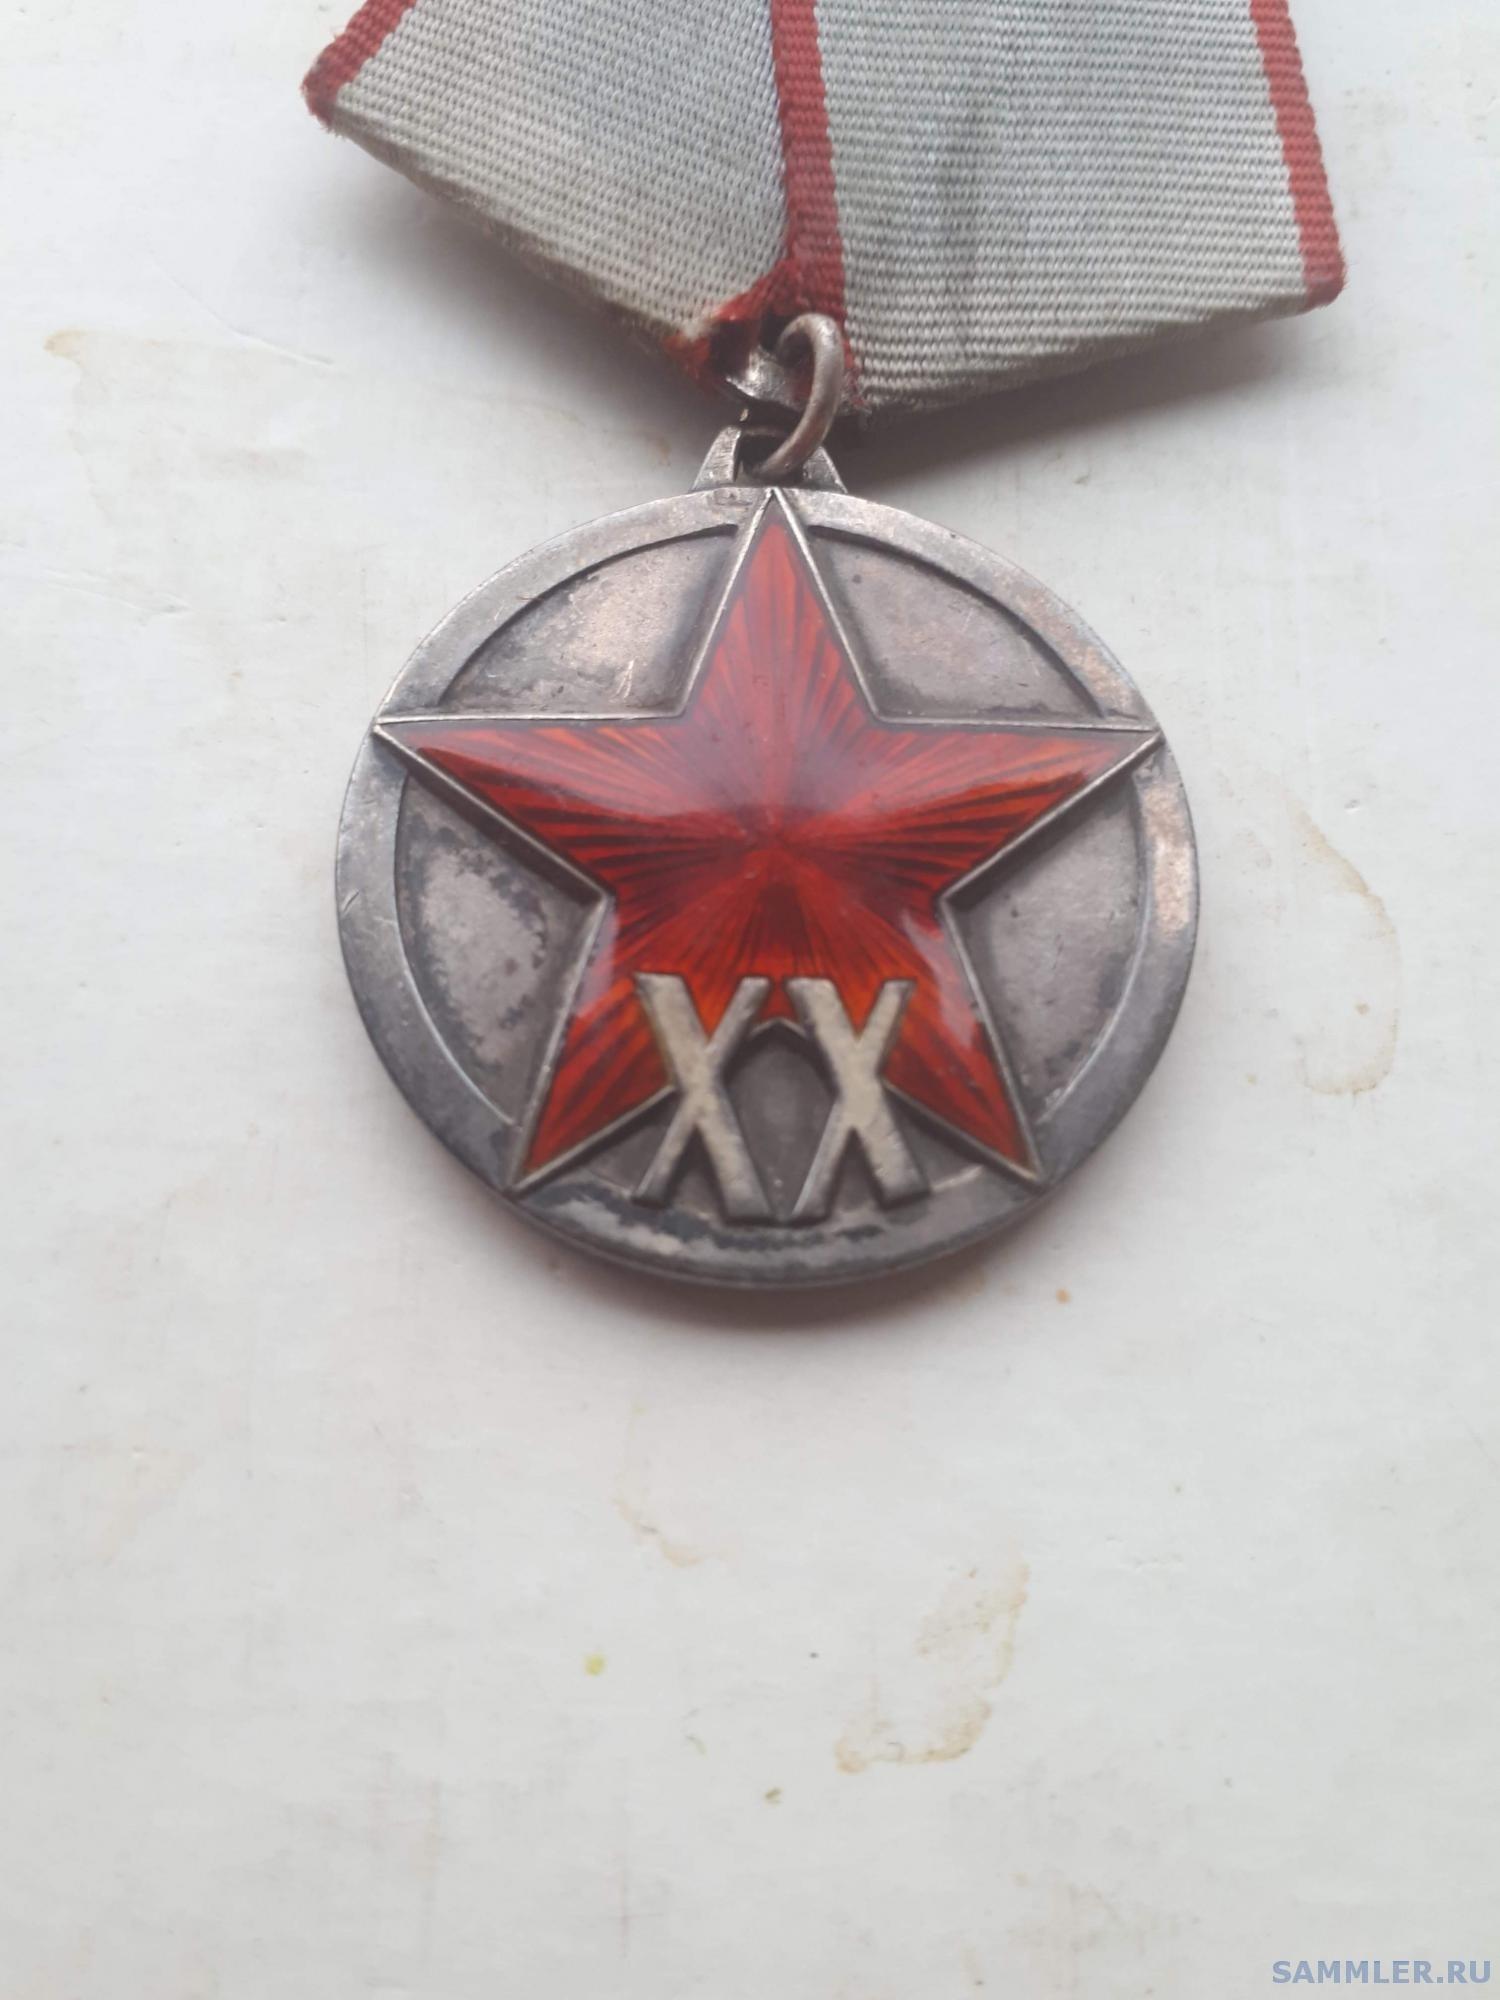 received_198876058562423.jpeg